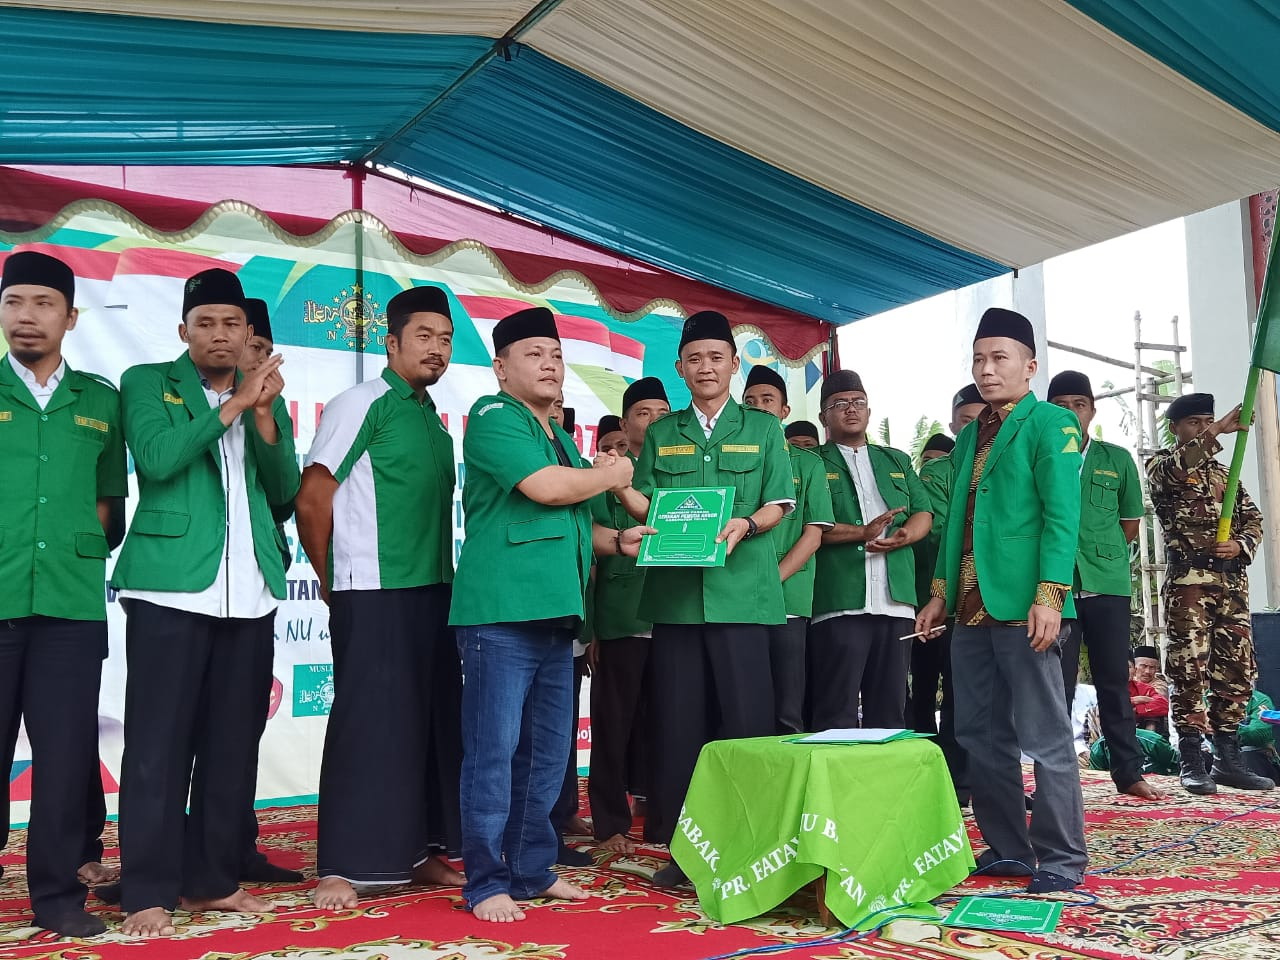 Resmi Dilantik, Ansor Bojong Diingatkan Tugas dan Tanggung jawab, GP Ansor